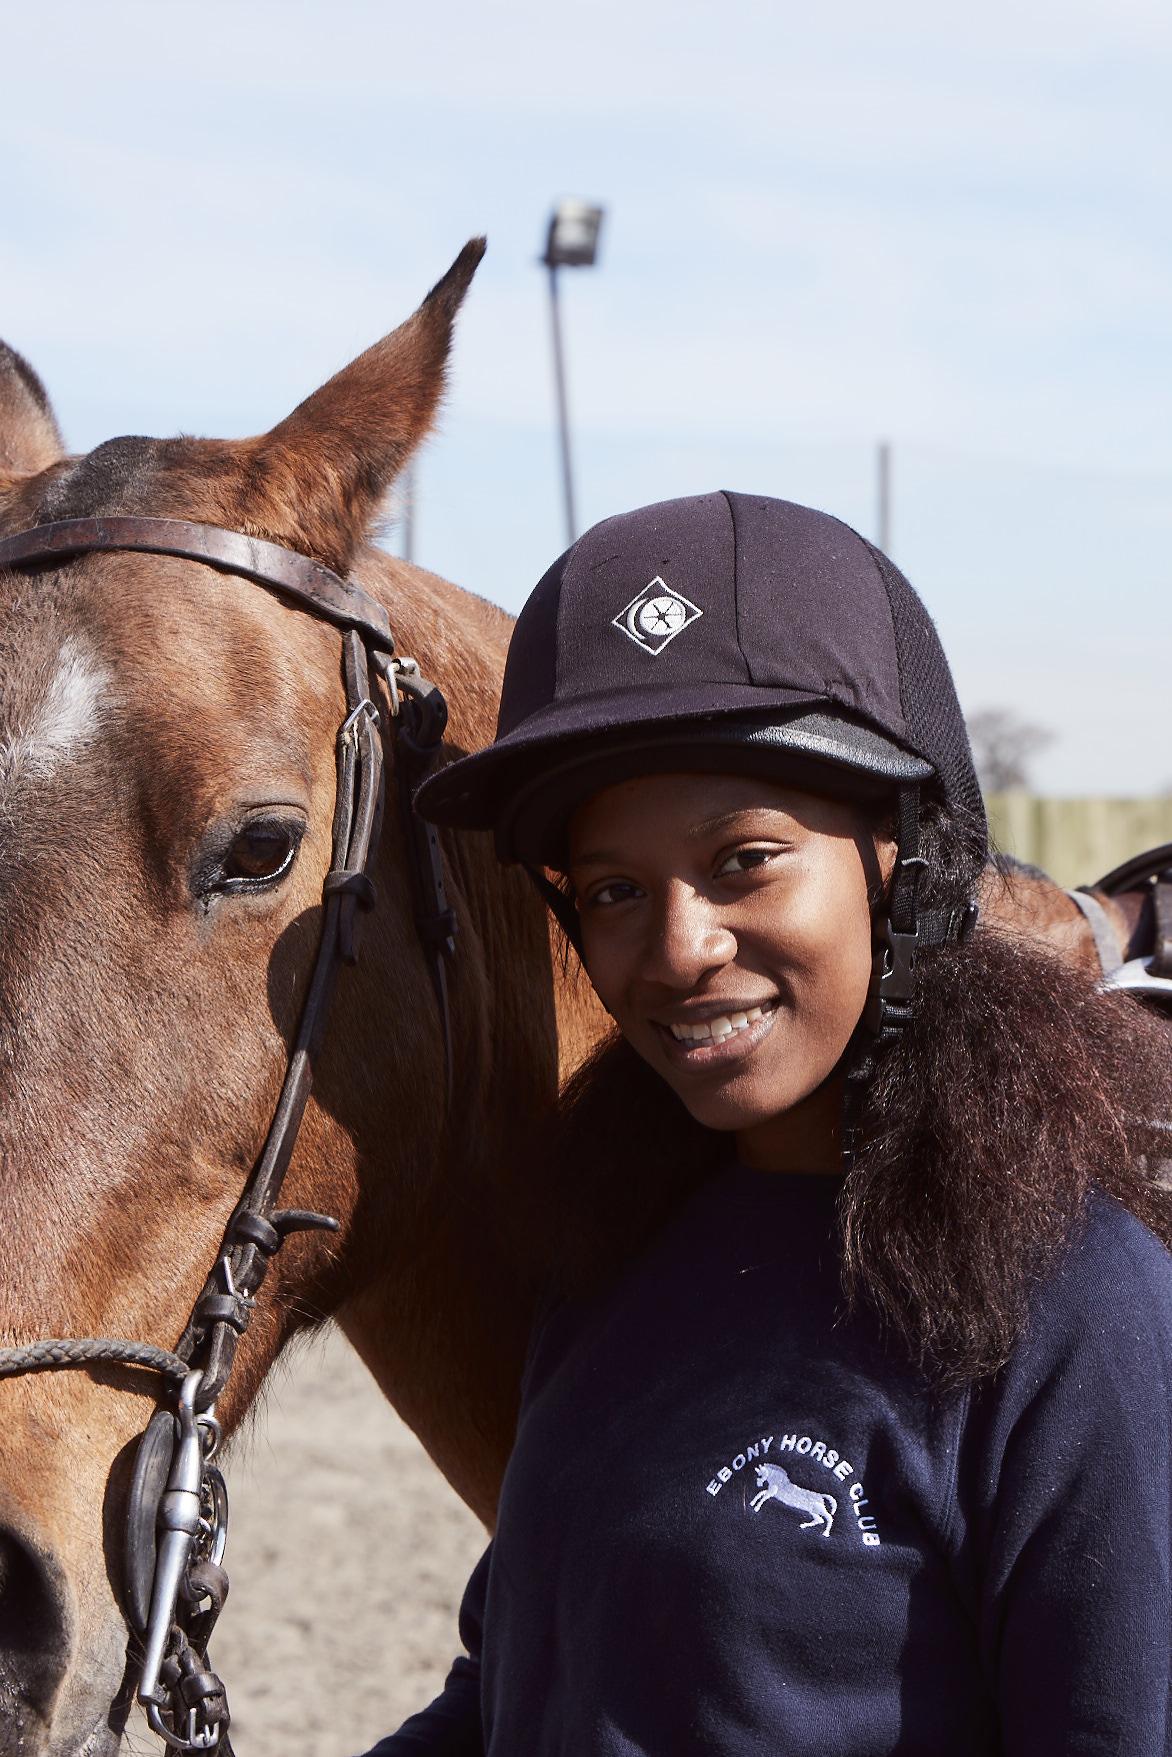 Racquel from Ebony horse club enjoying polo.jpg